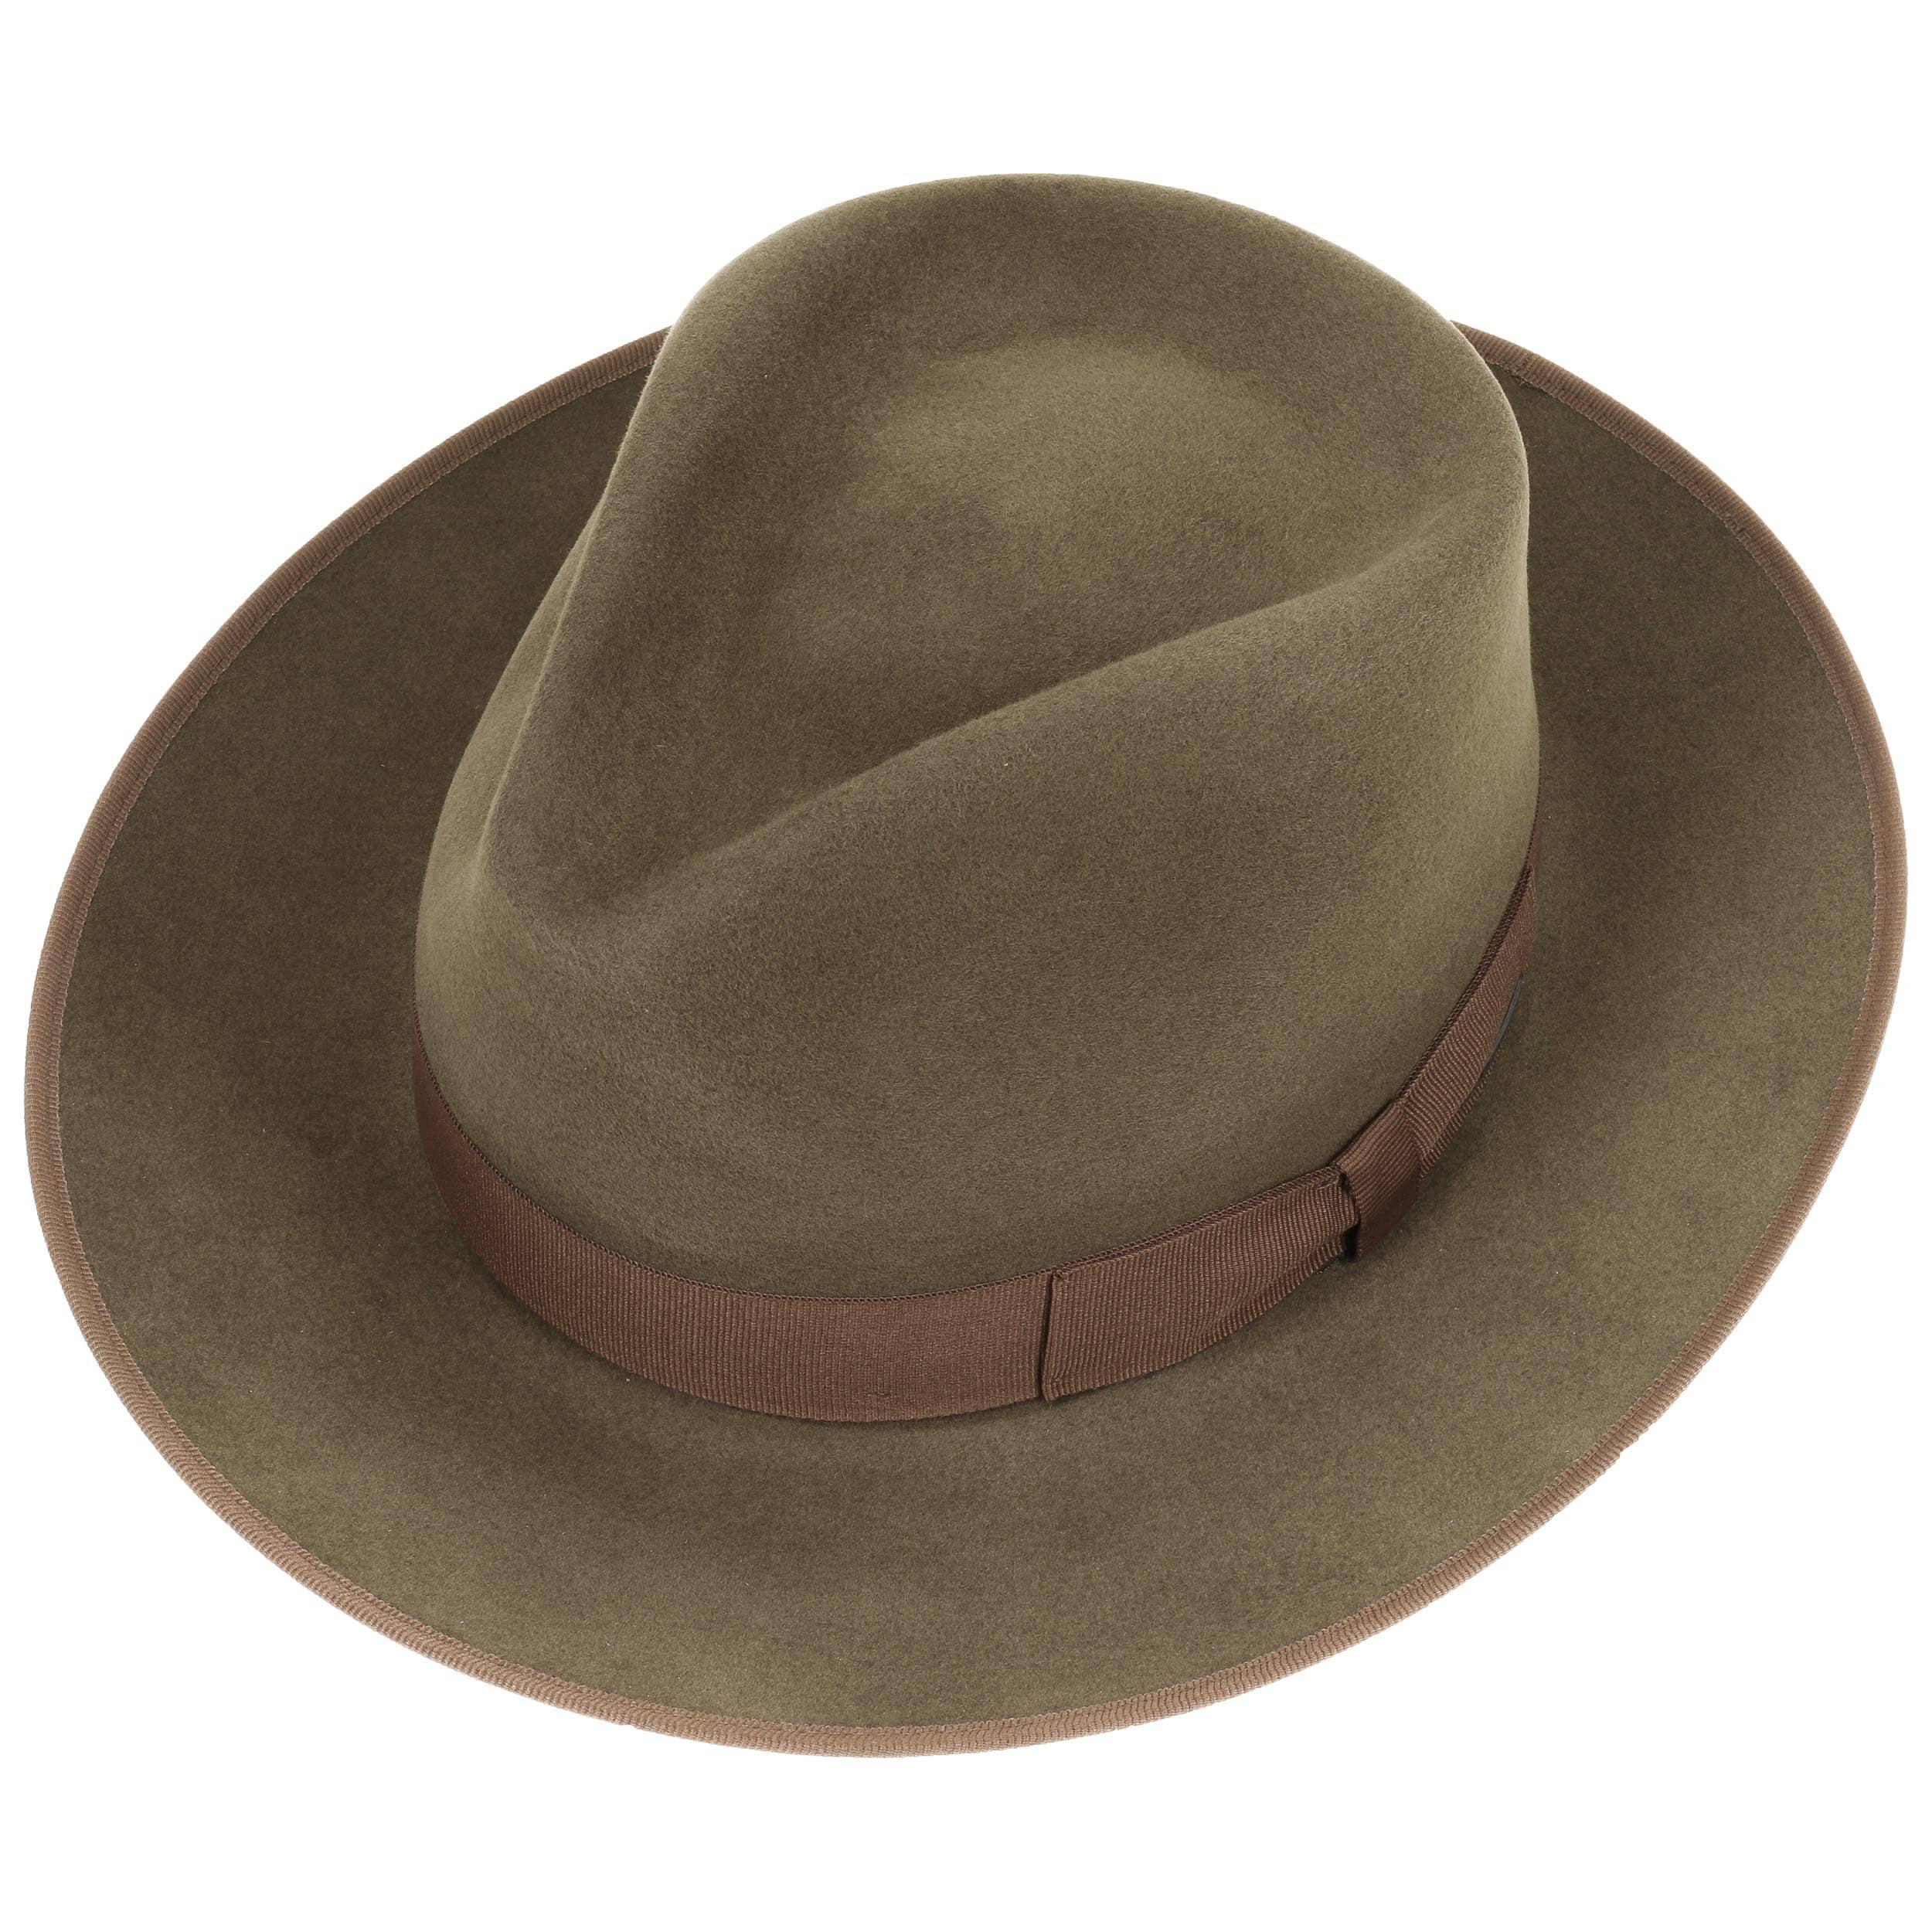 Sombrero de Fieltro Virgi by Stetson - Sombreros - sombreroshop.es 0762b8a720a